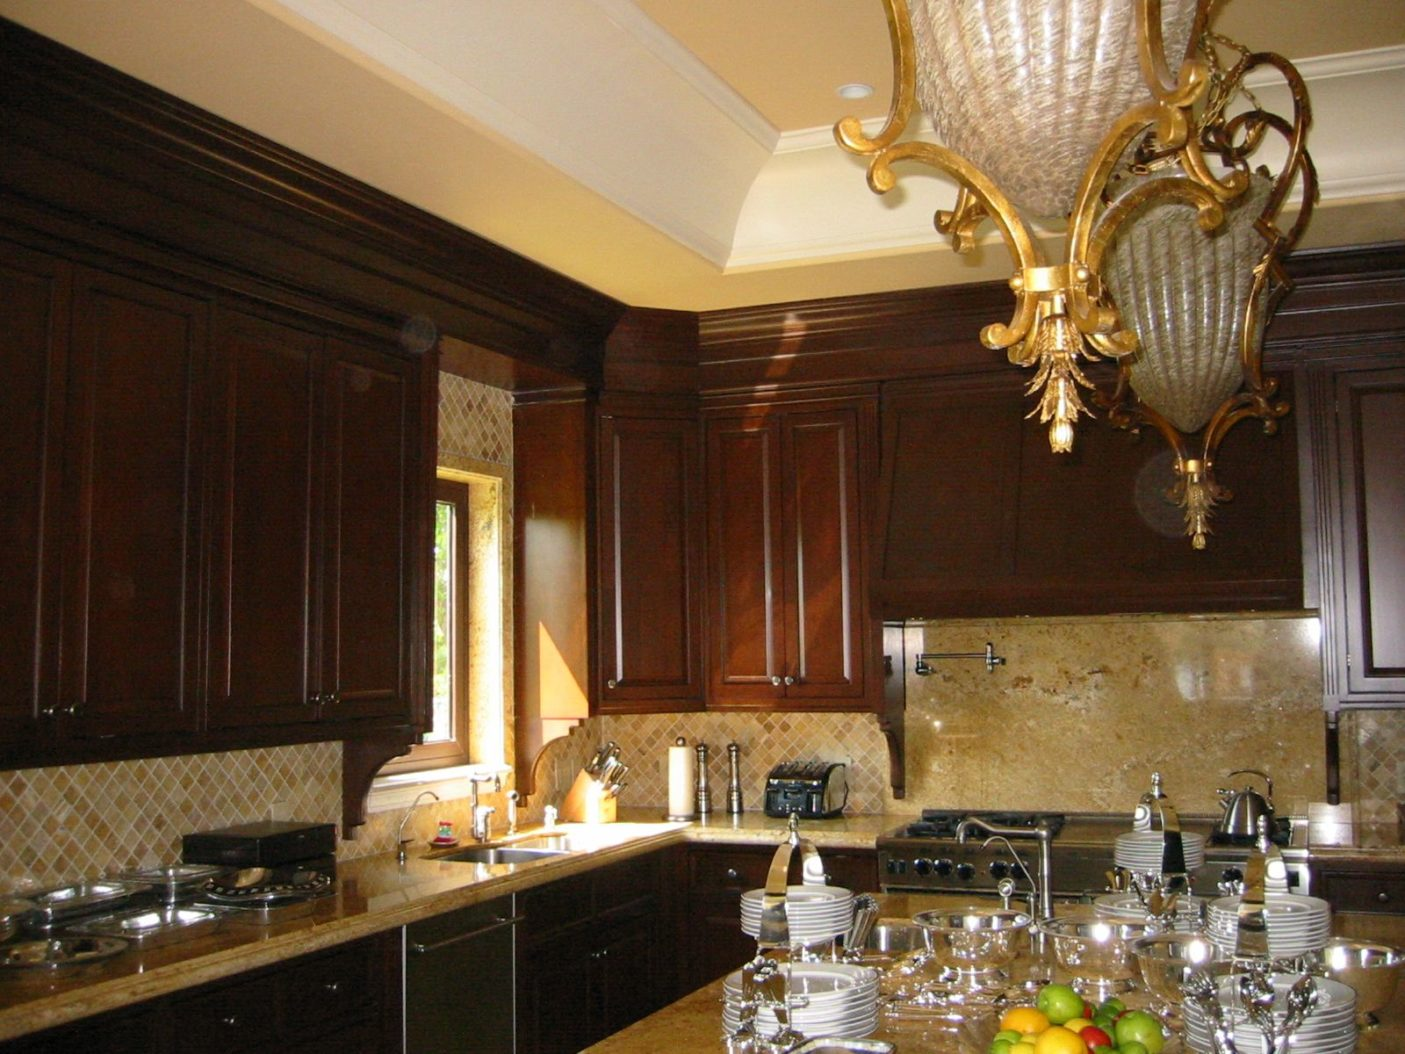 Kitchens-195.jpg